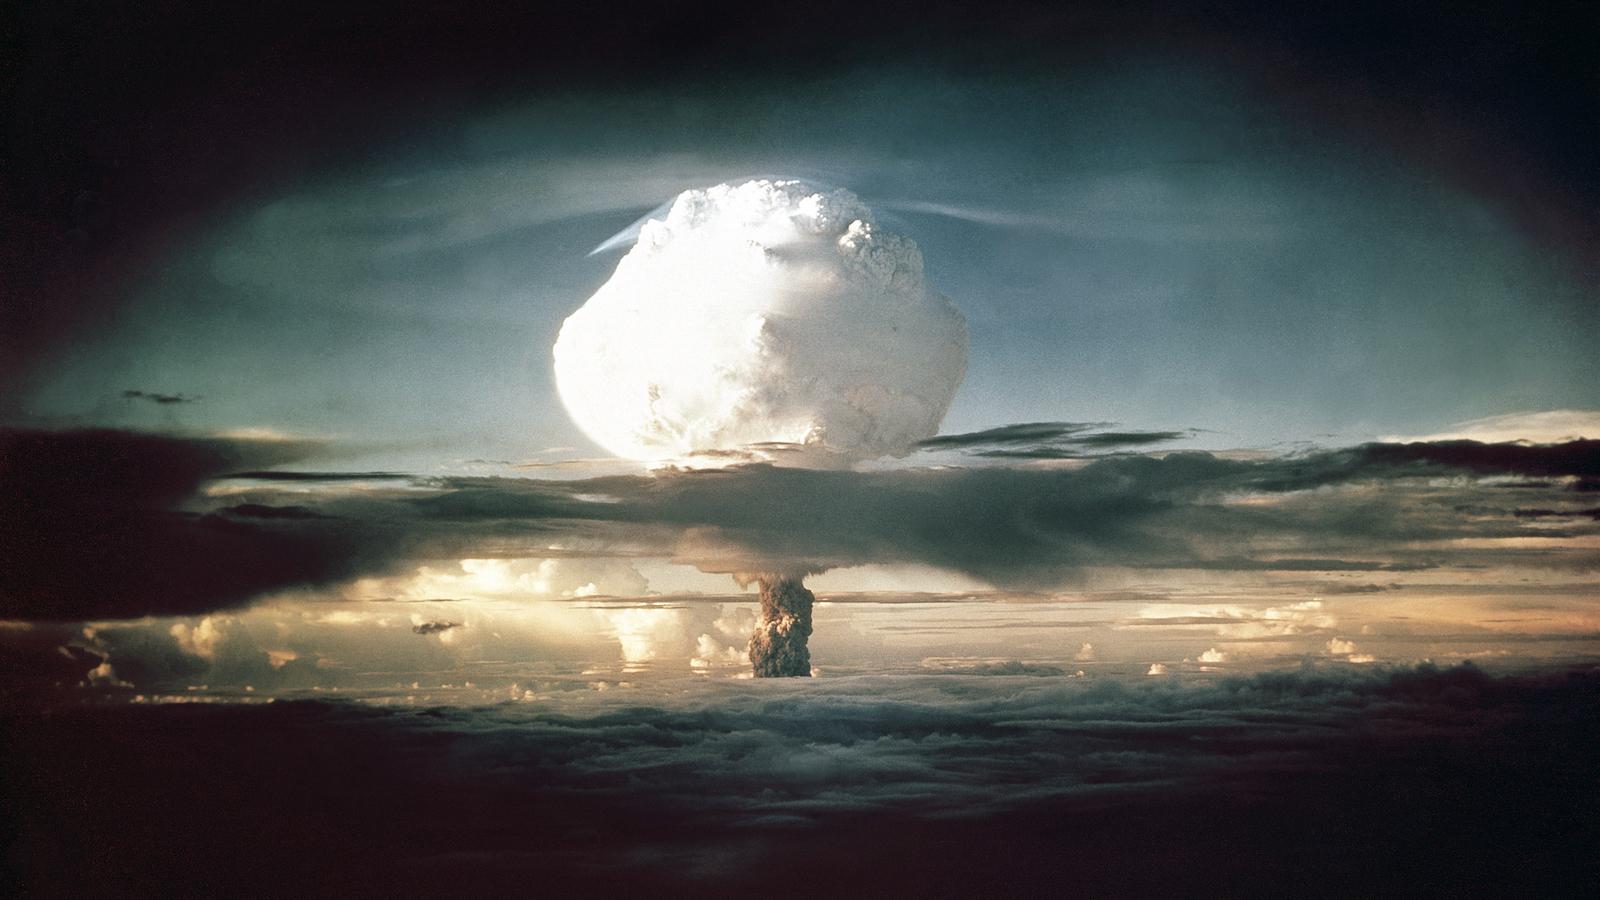 mushroom cloud from nuclear bomb